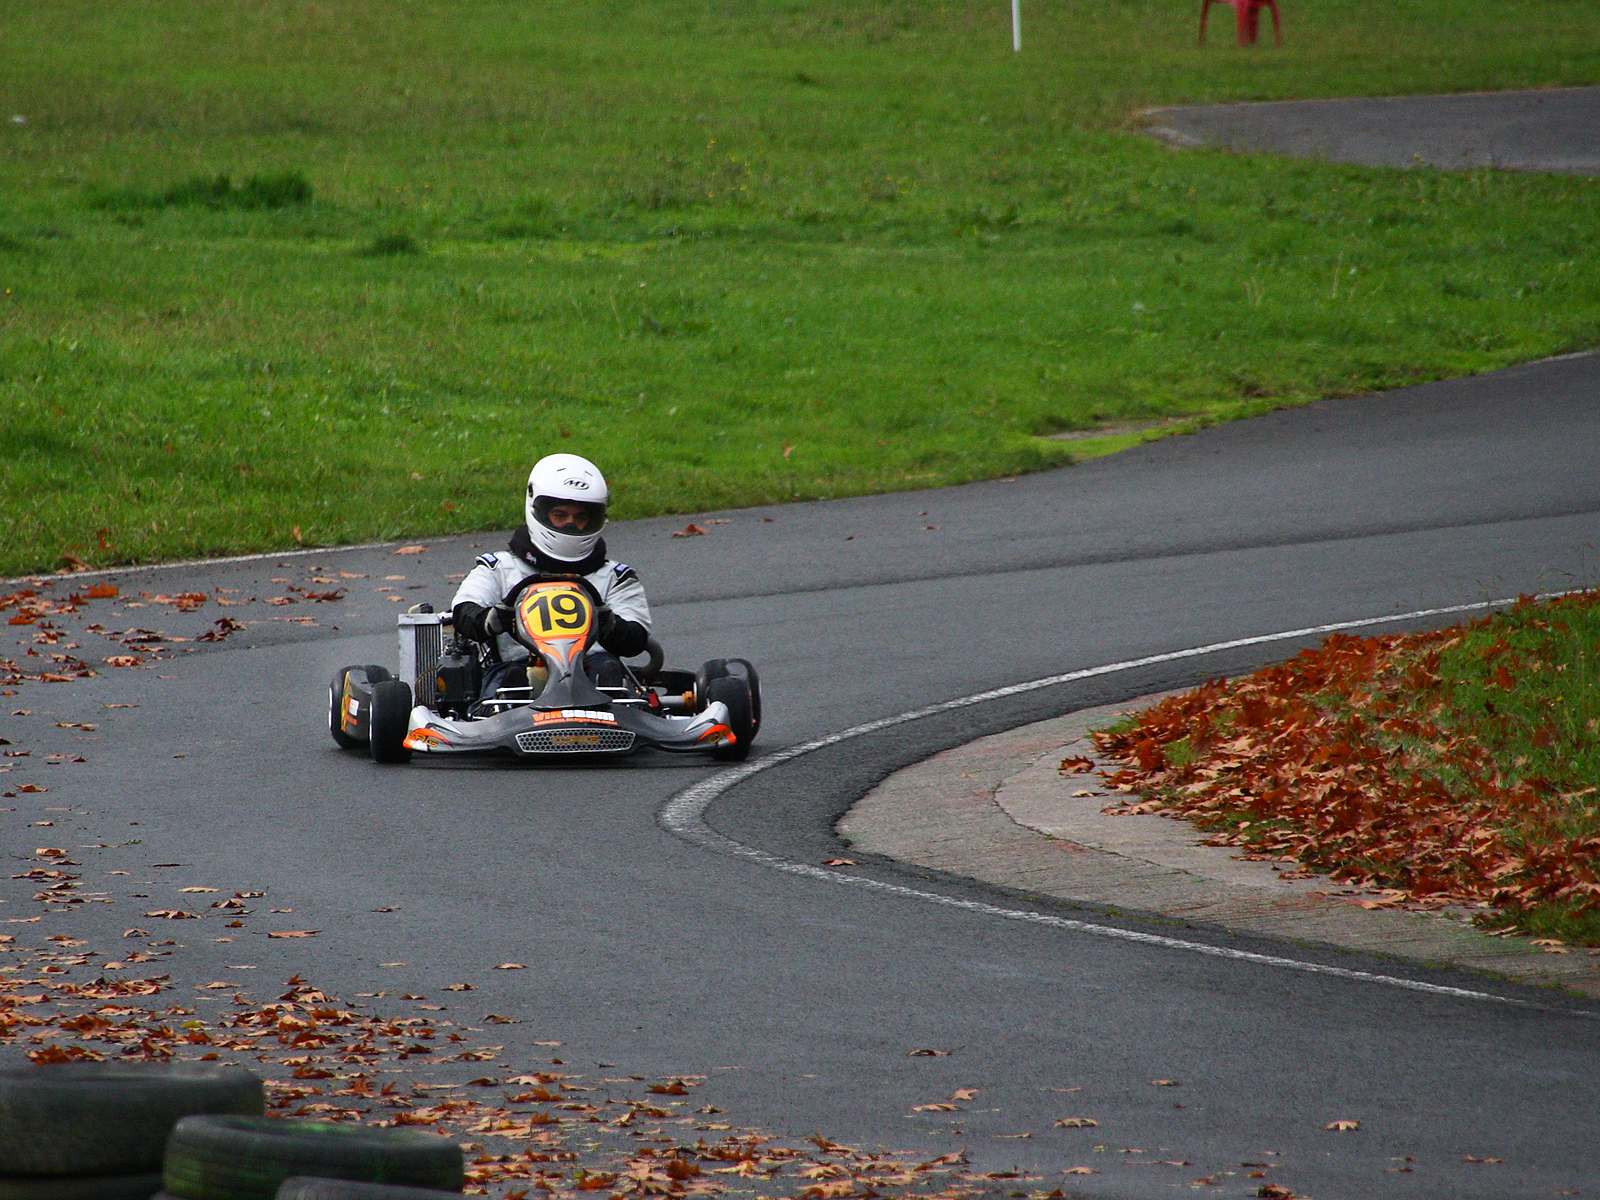 Circuito Olaberria : Karting virteam más fotos última prueba olaberría